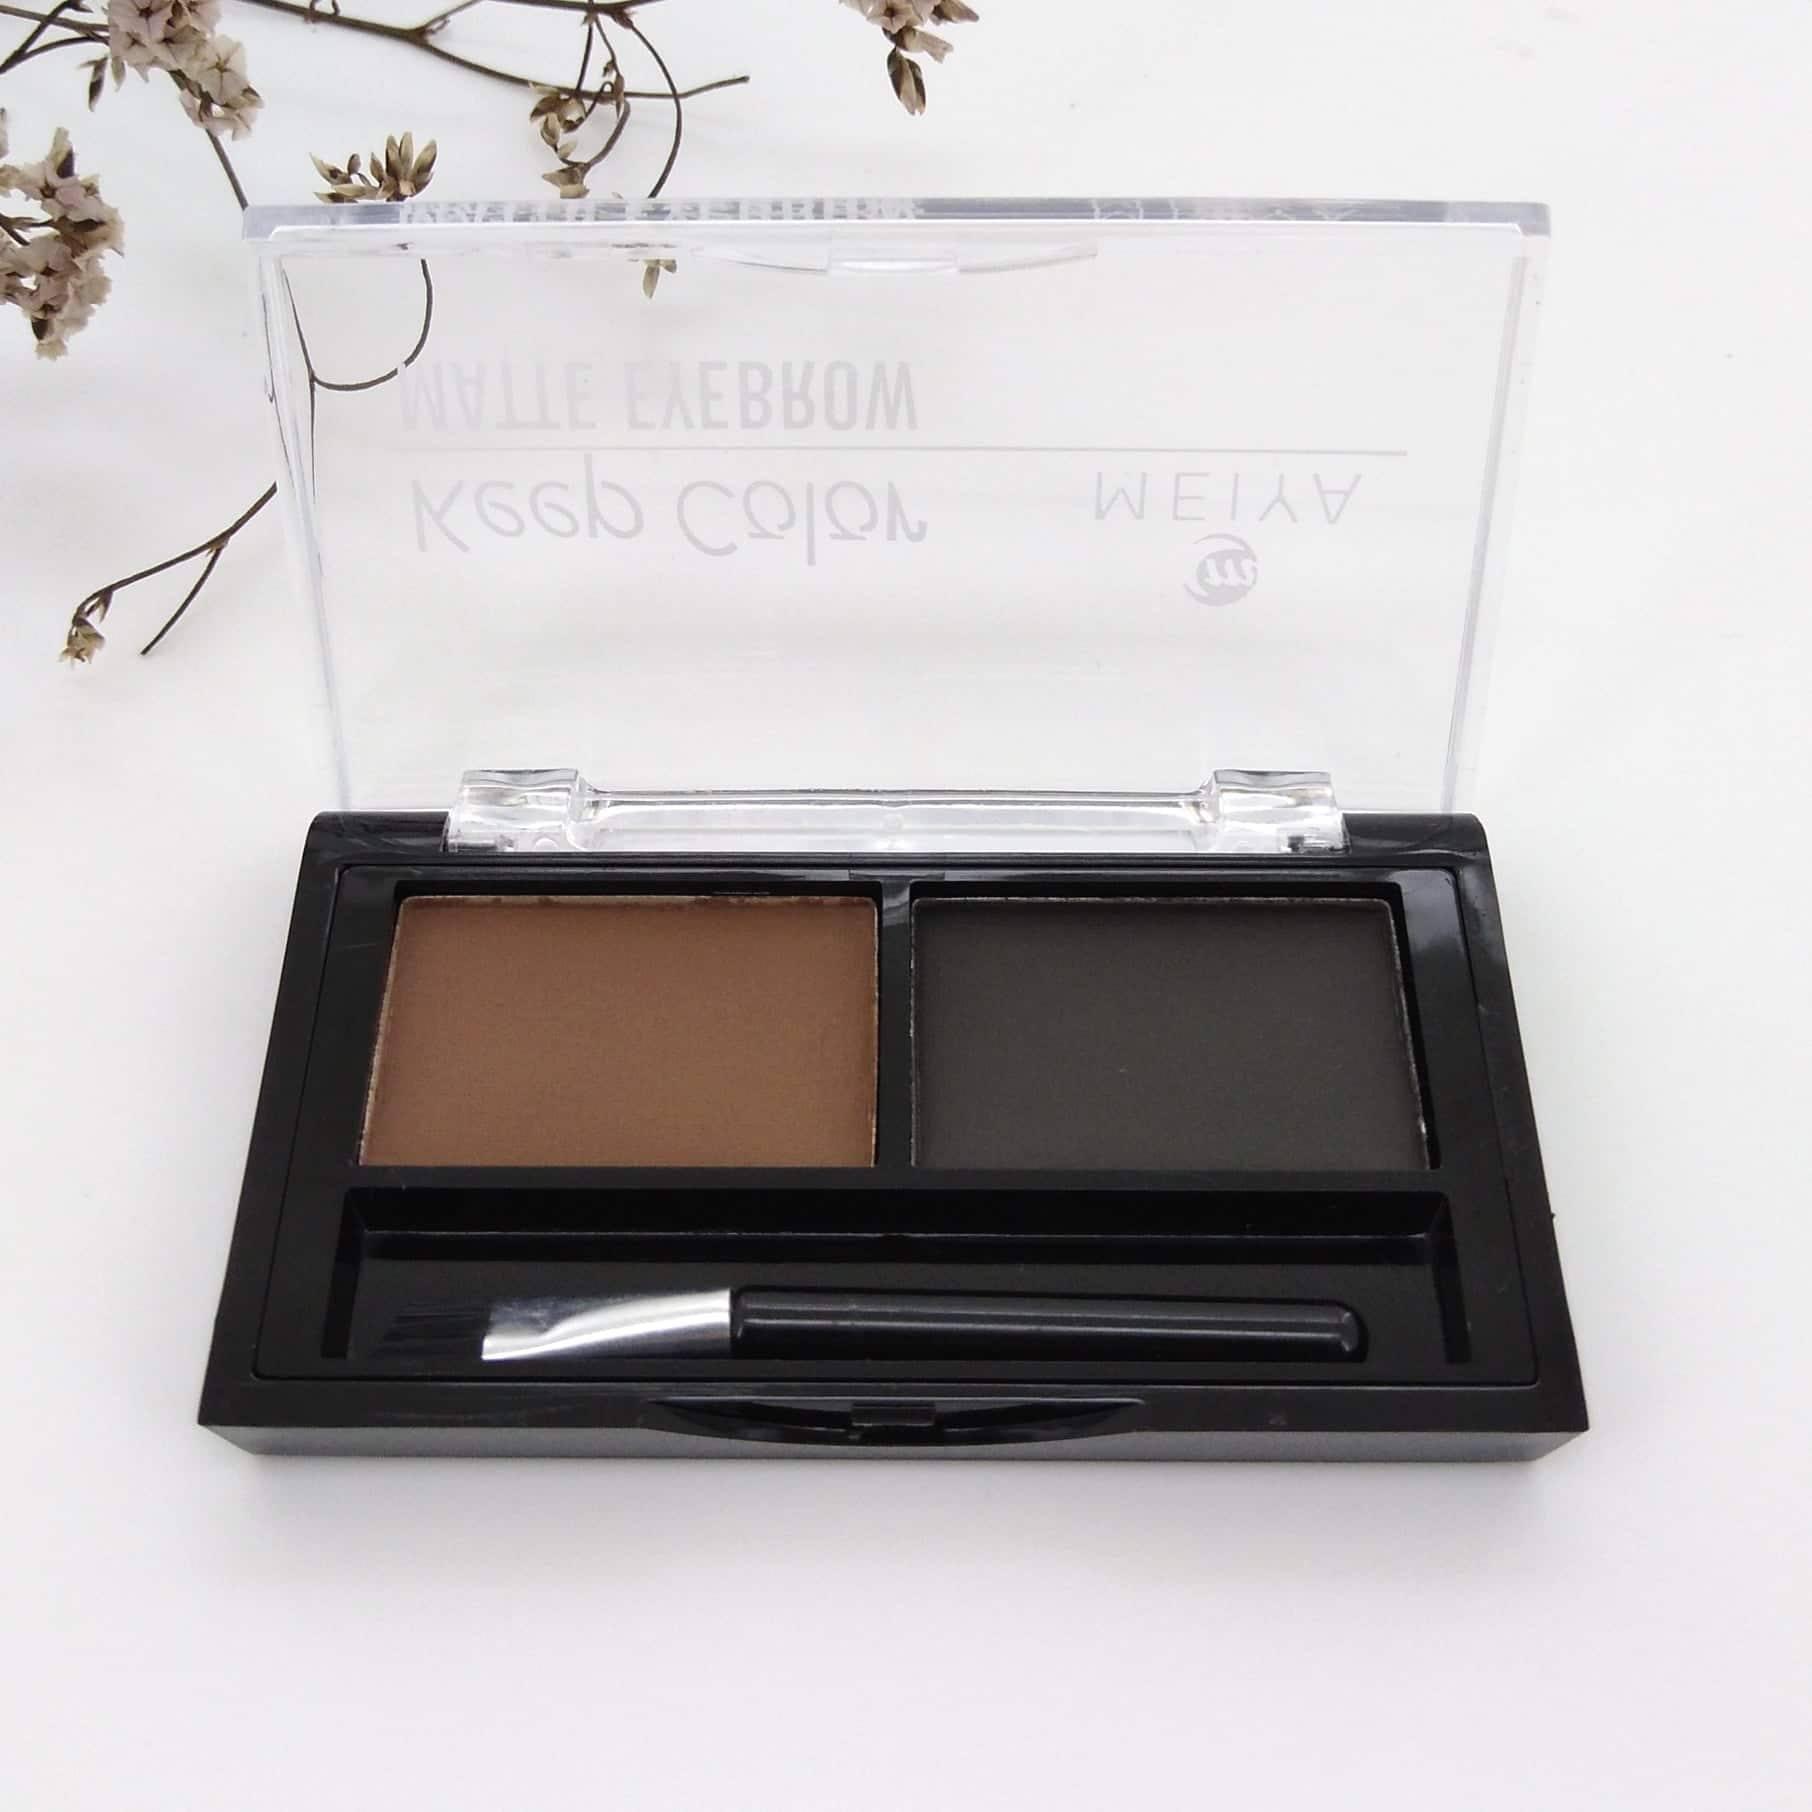 MEIYA Keep Color Matte Eyebrow Powder with Brush (ME-008) Philippines